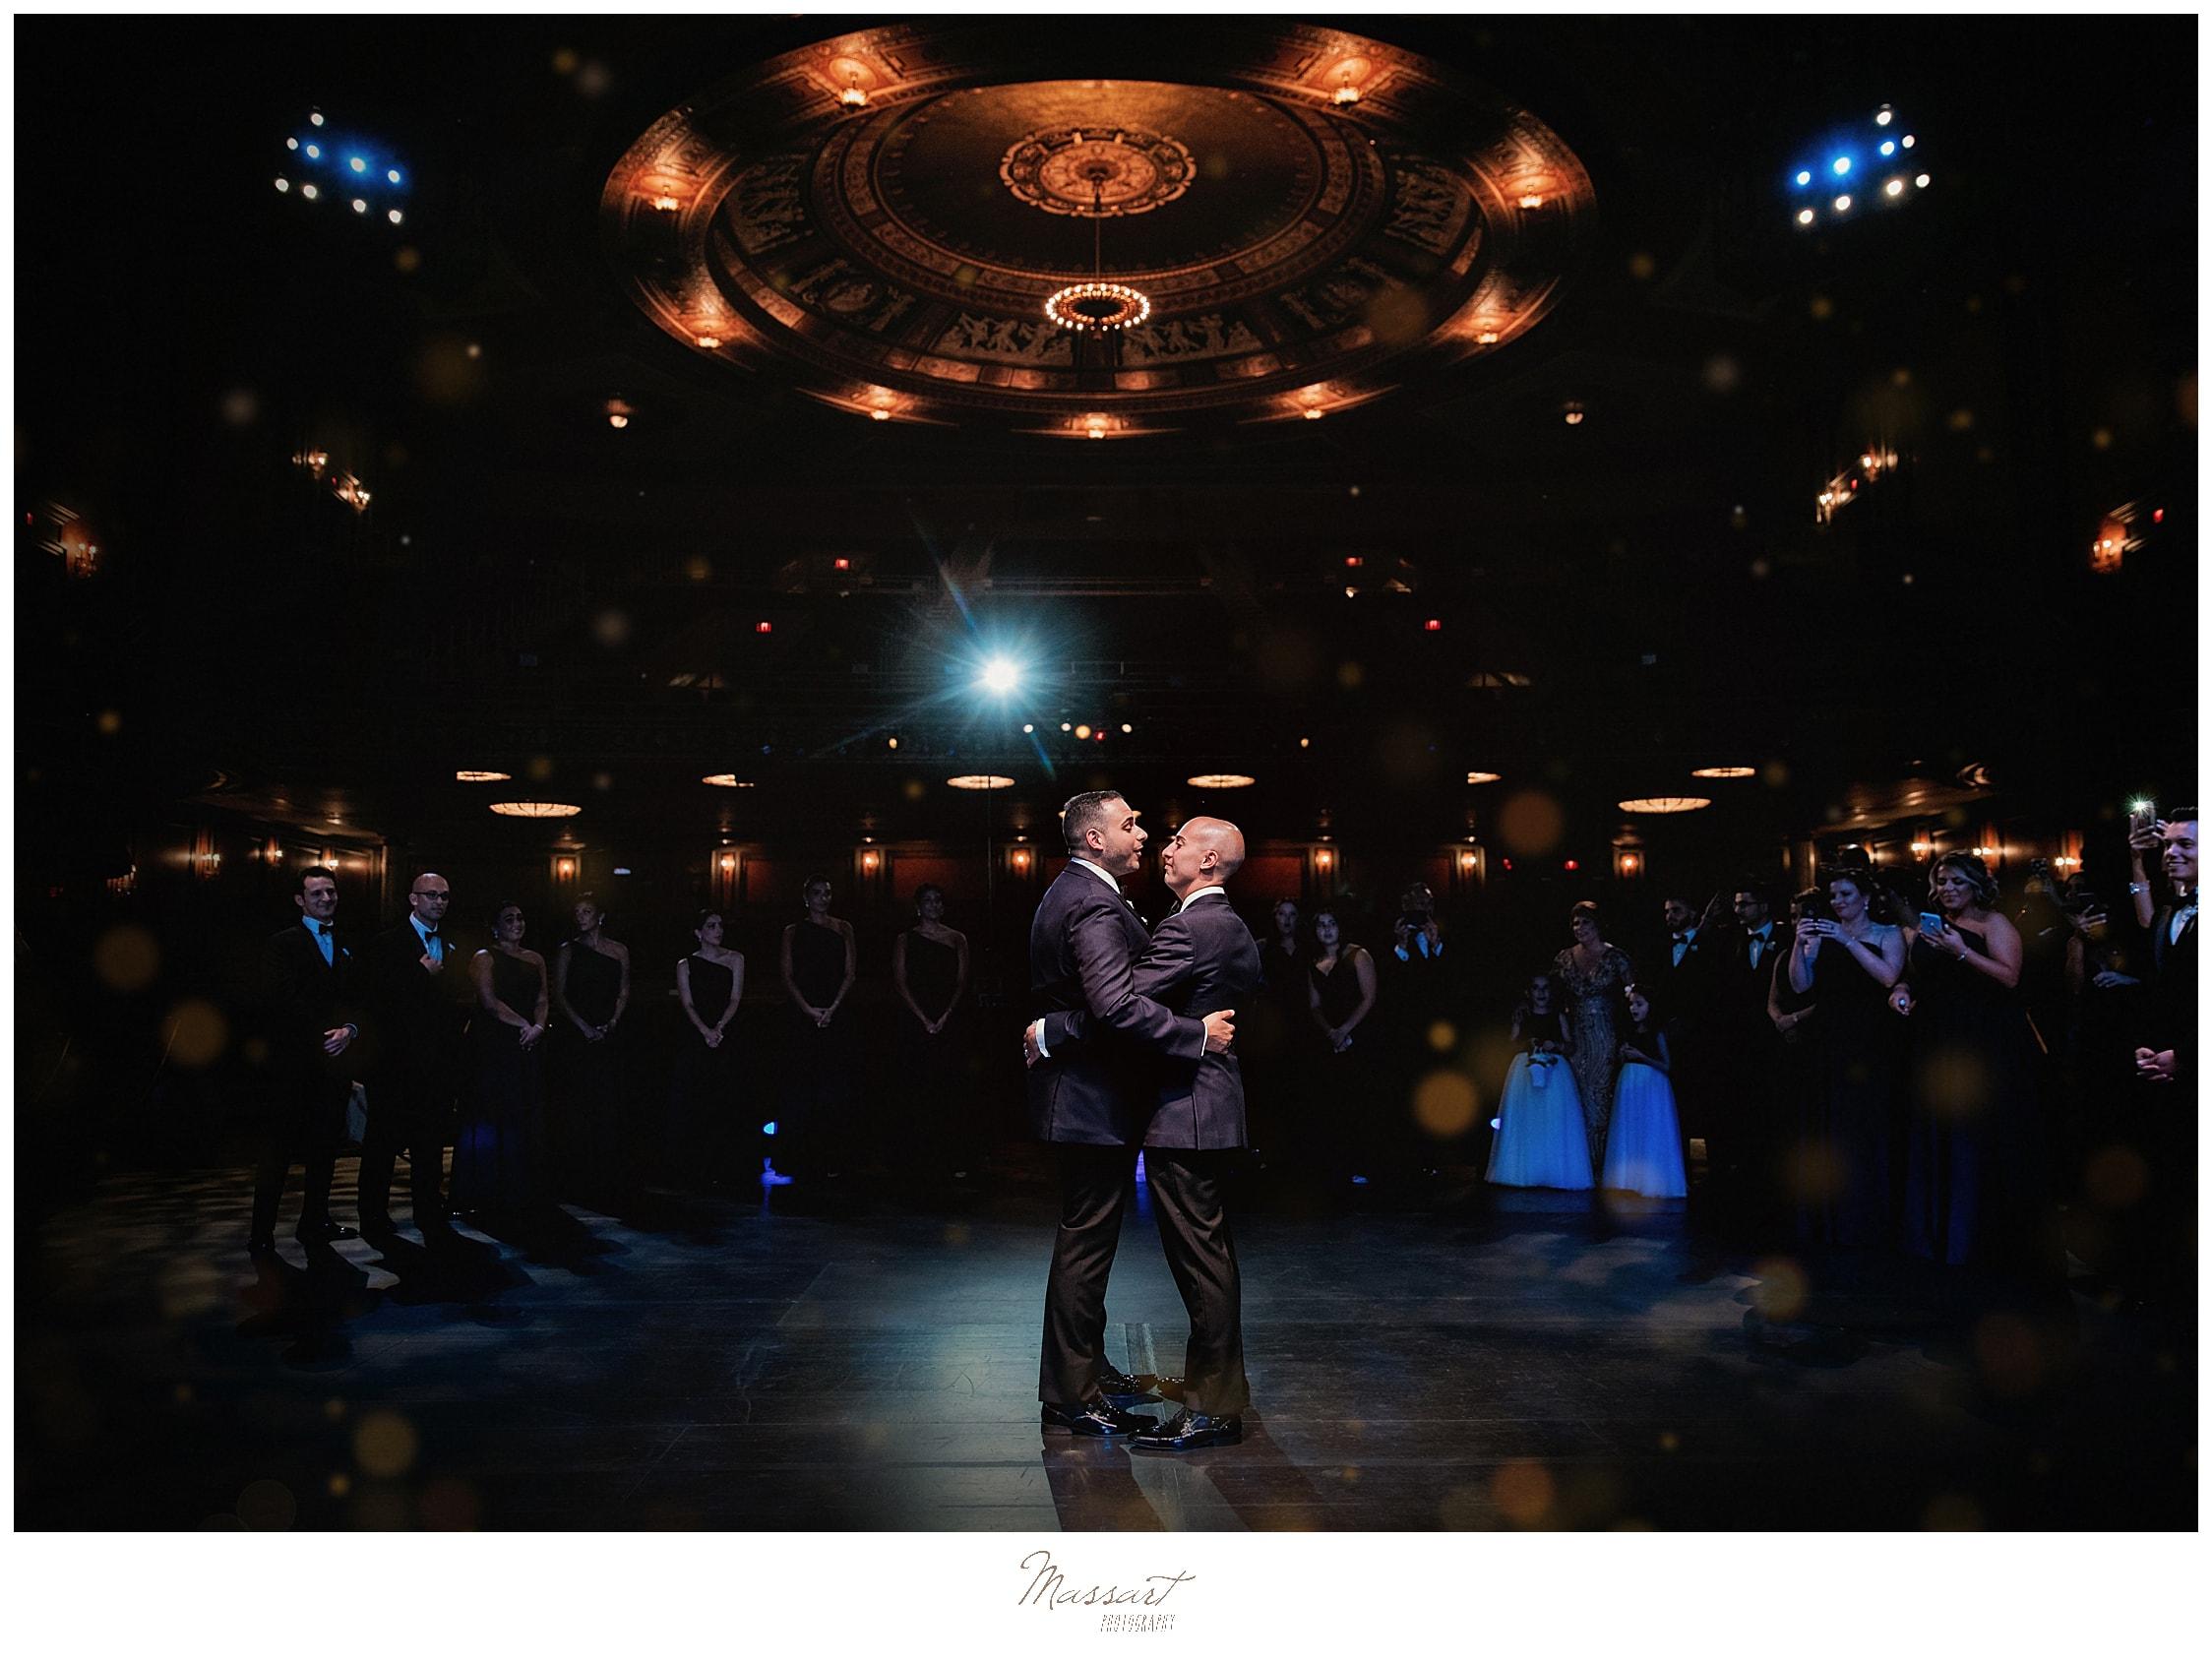 glamorous wedding portraits in Palace Theater with CT wedding photographers Massart Photography